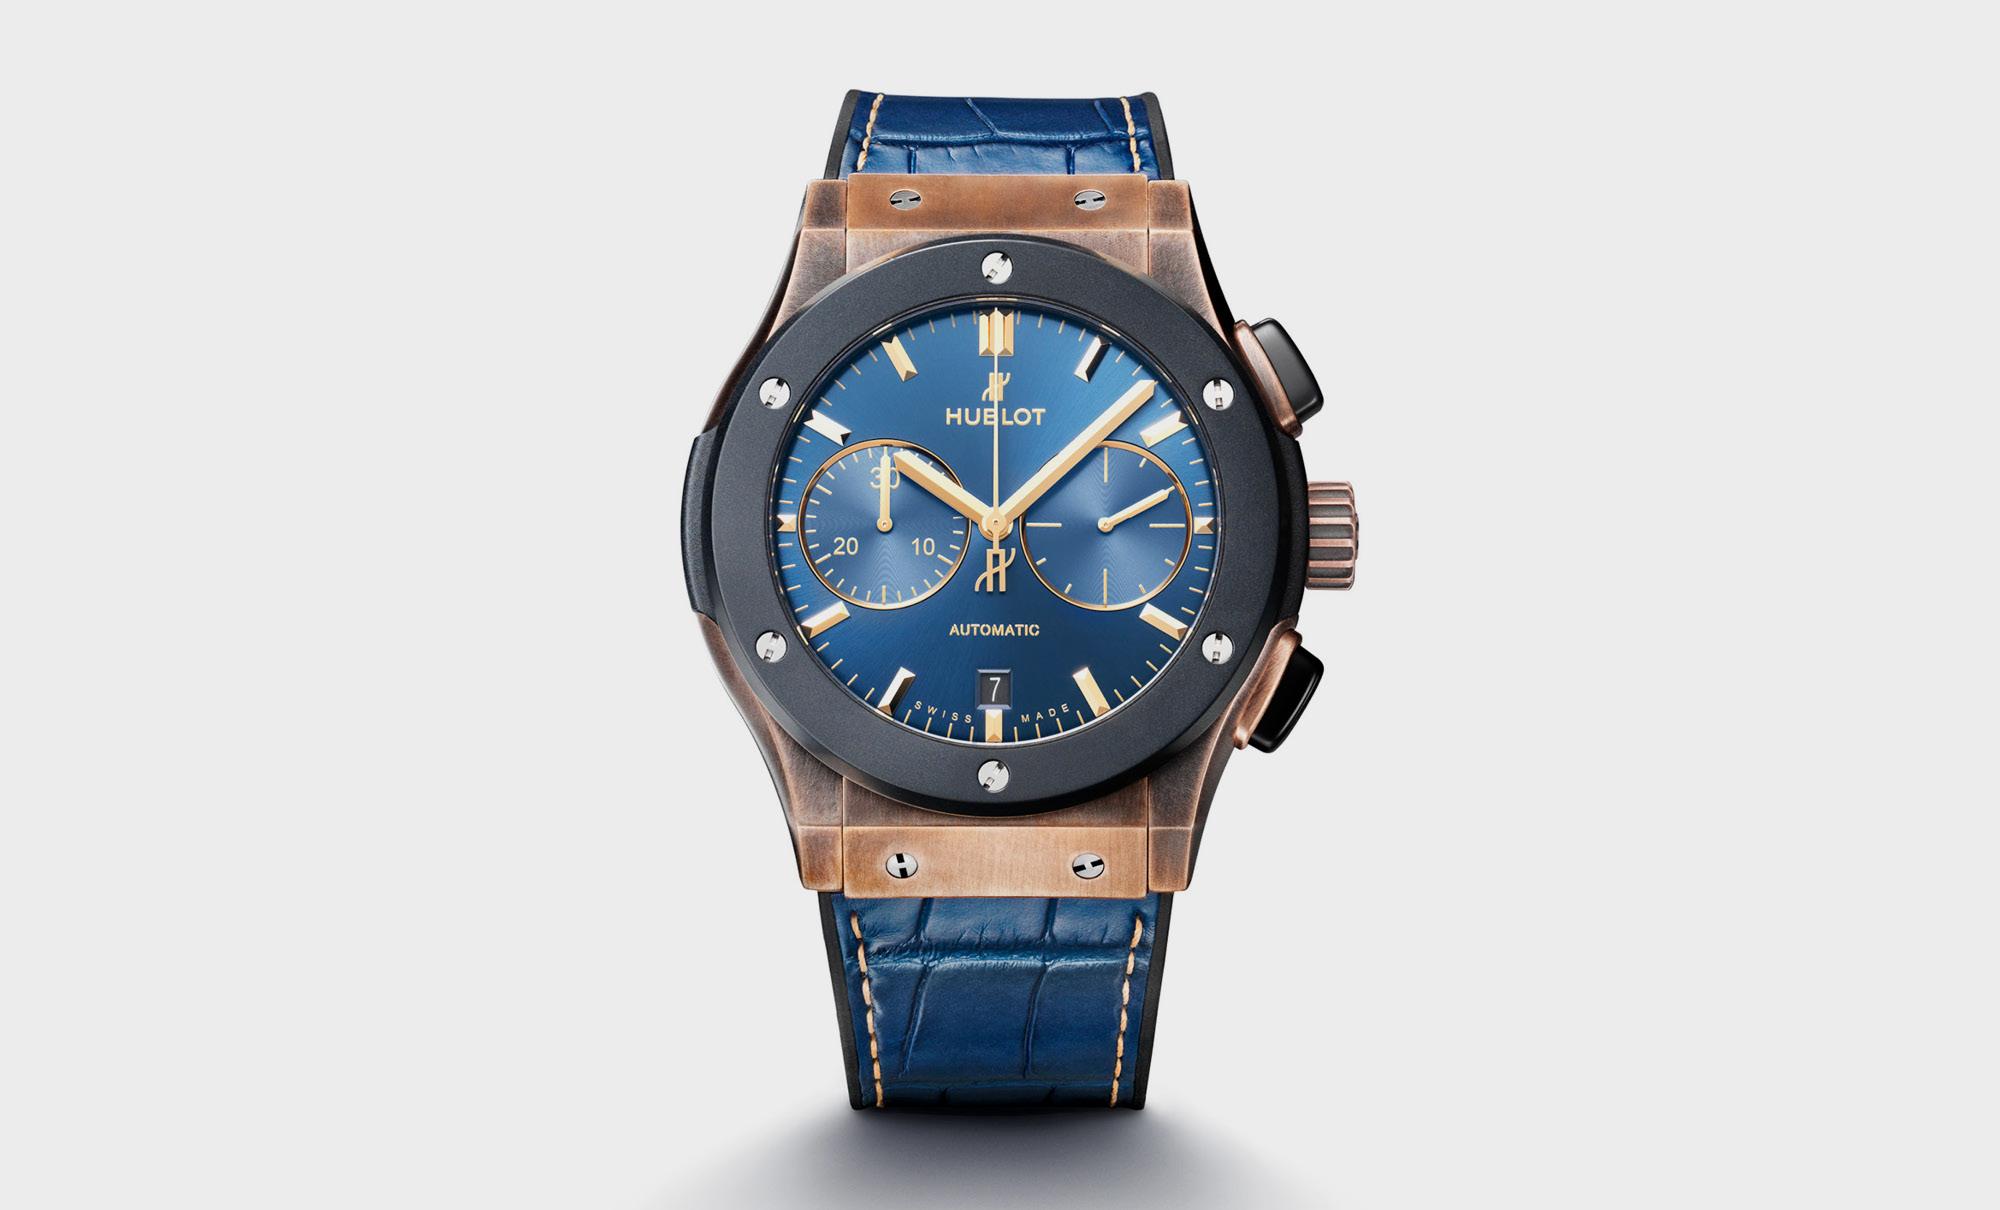 Hublot Classic Fusion Blue Edition, £15,000